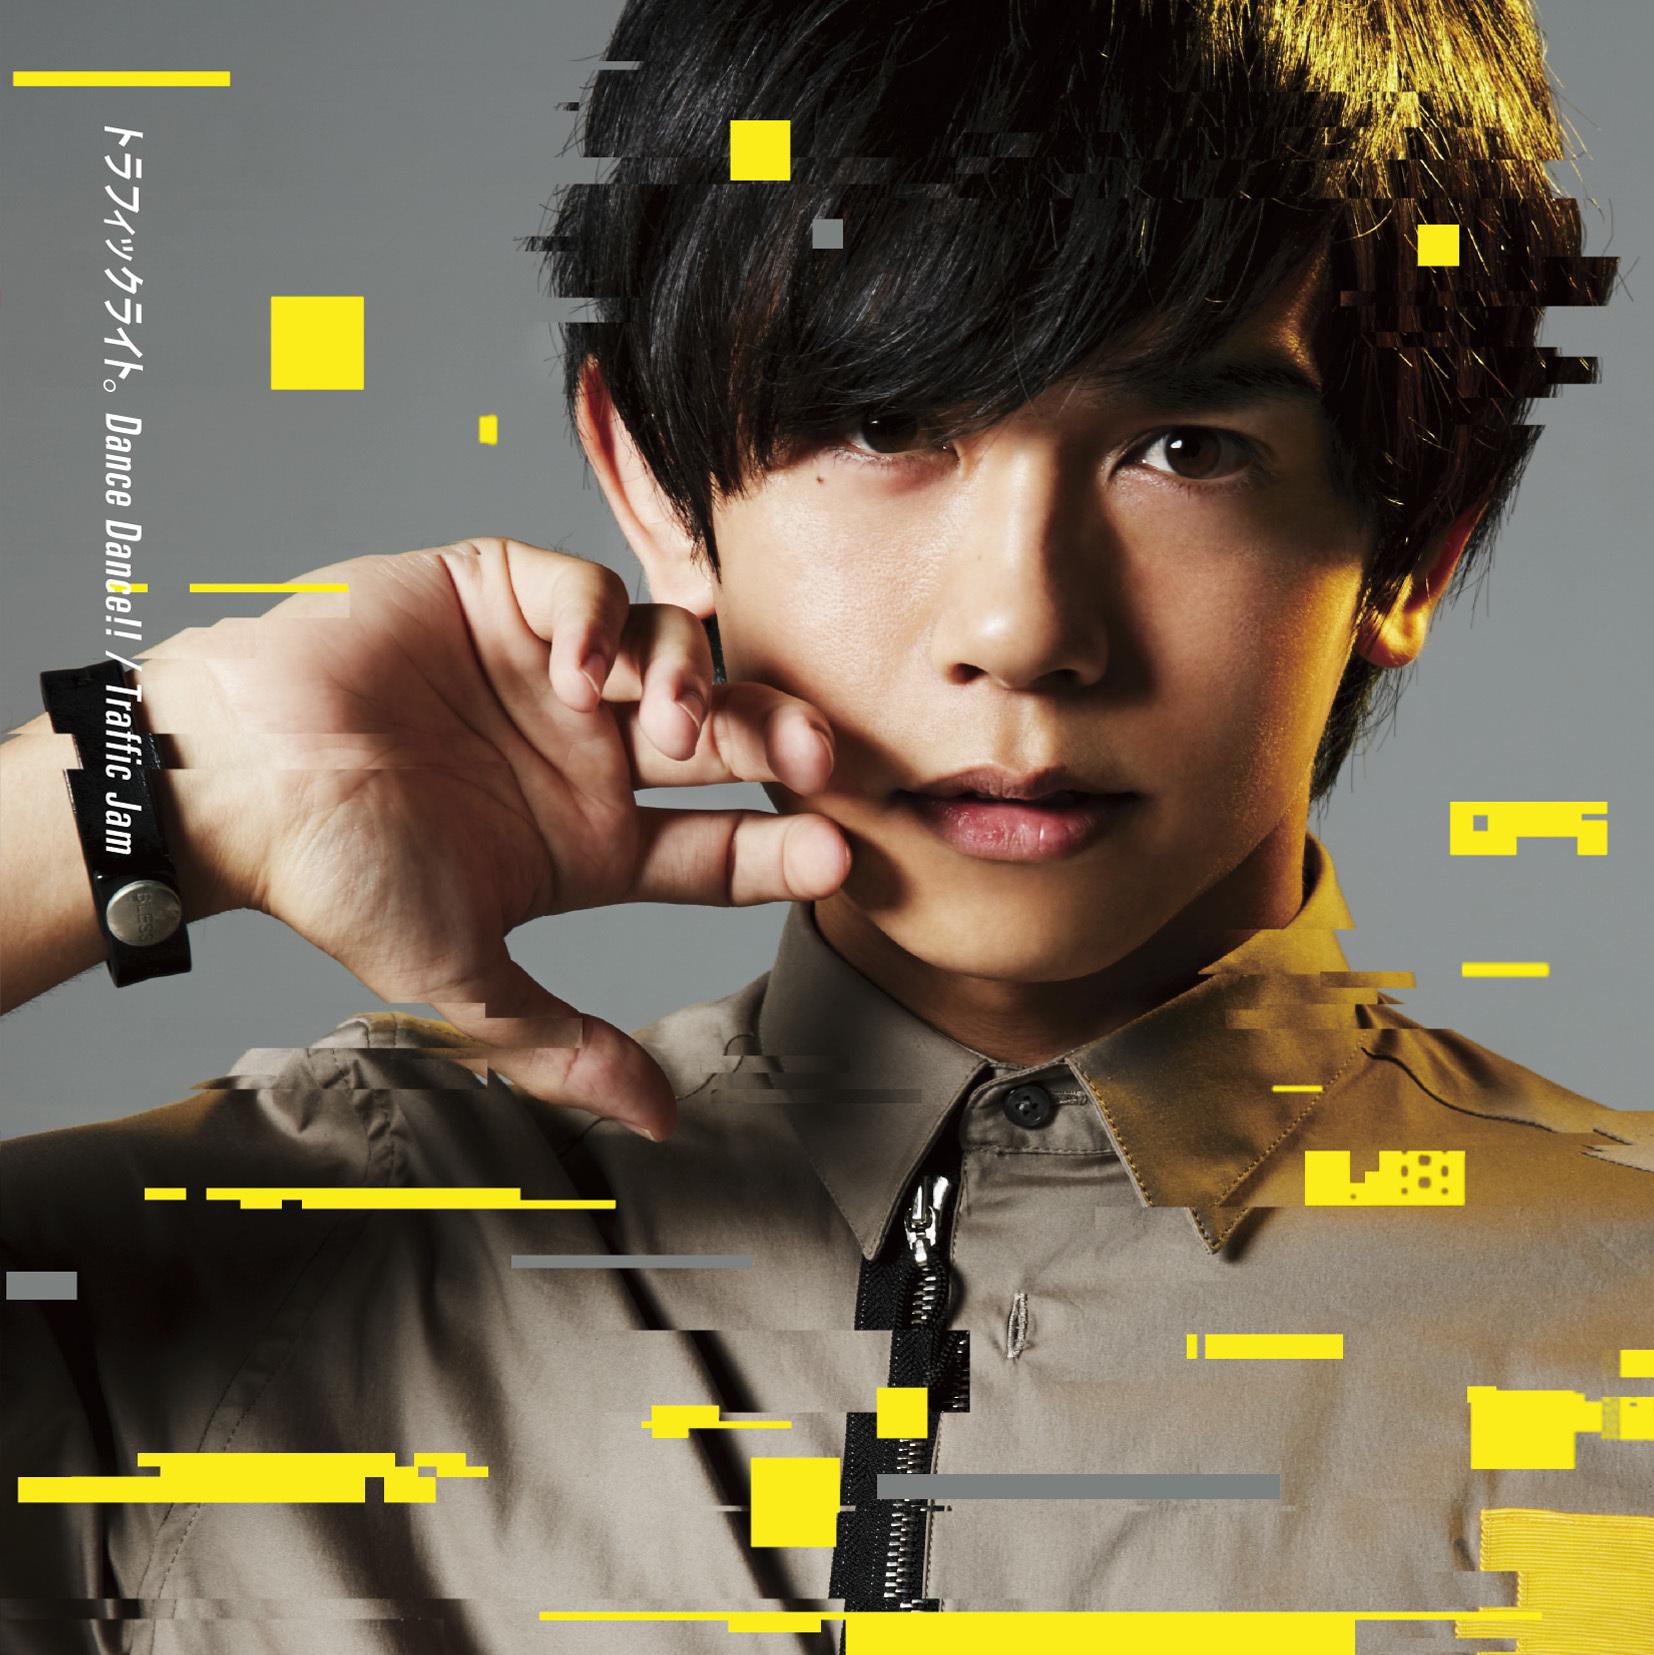 初回限定盤B/Shiroro ver.